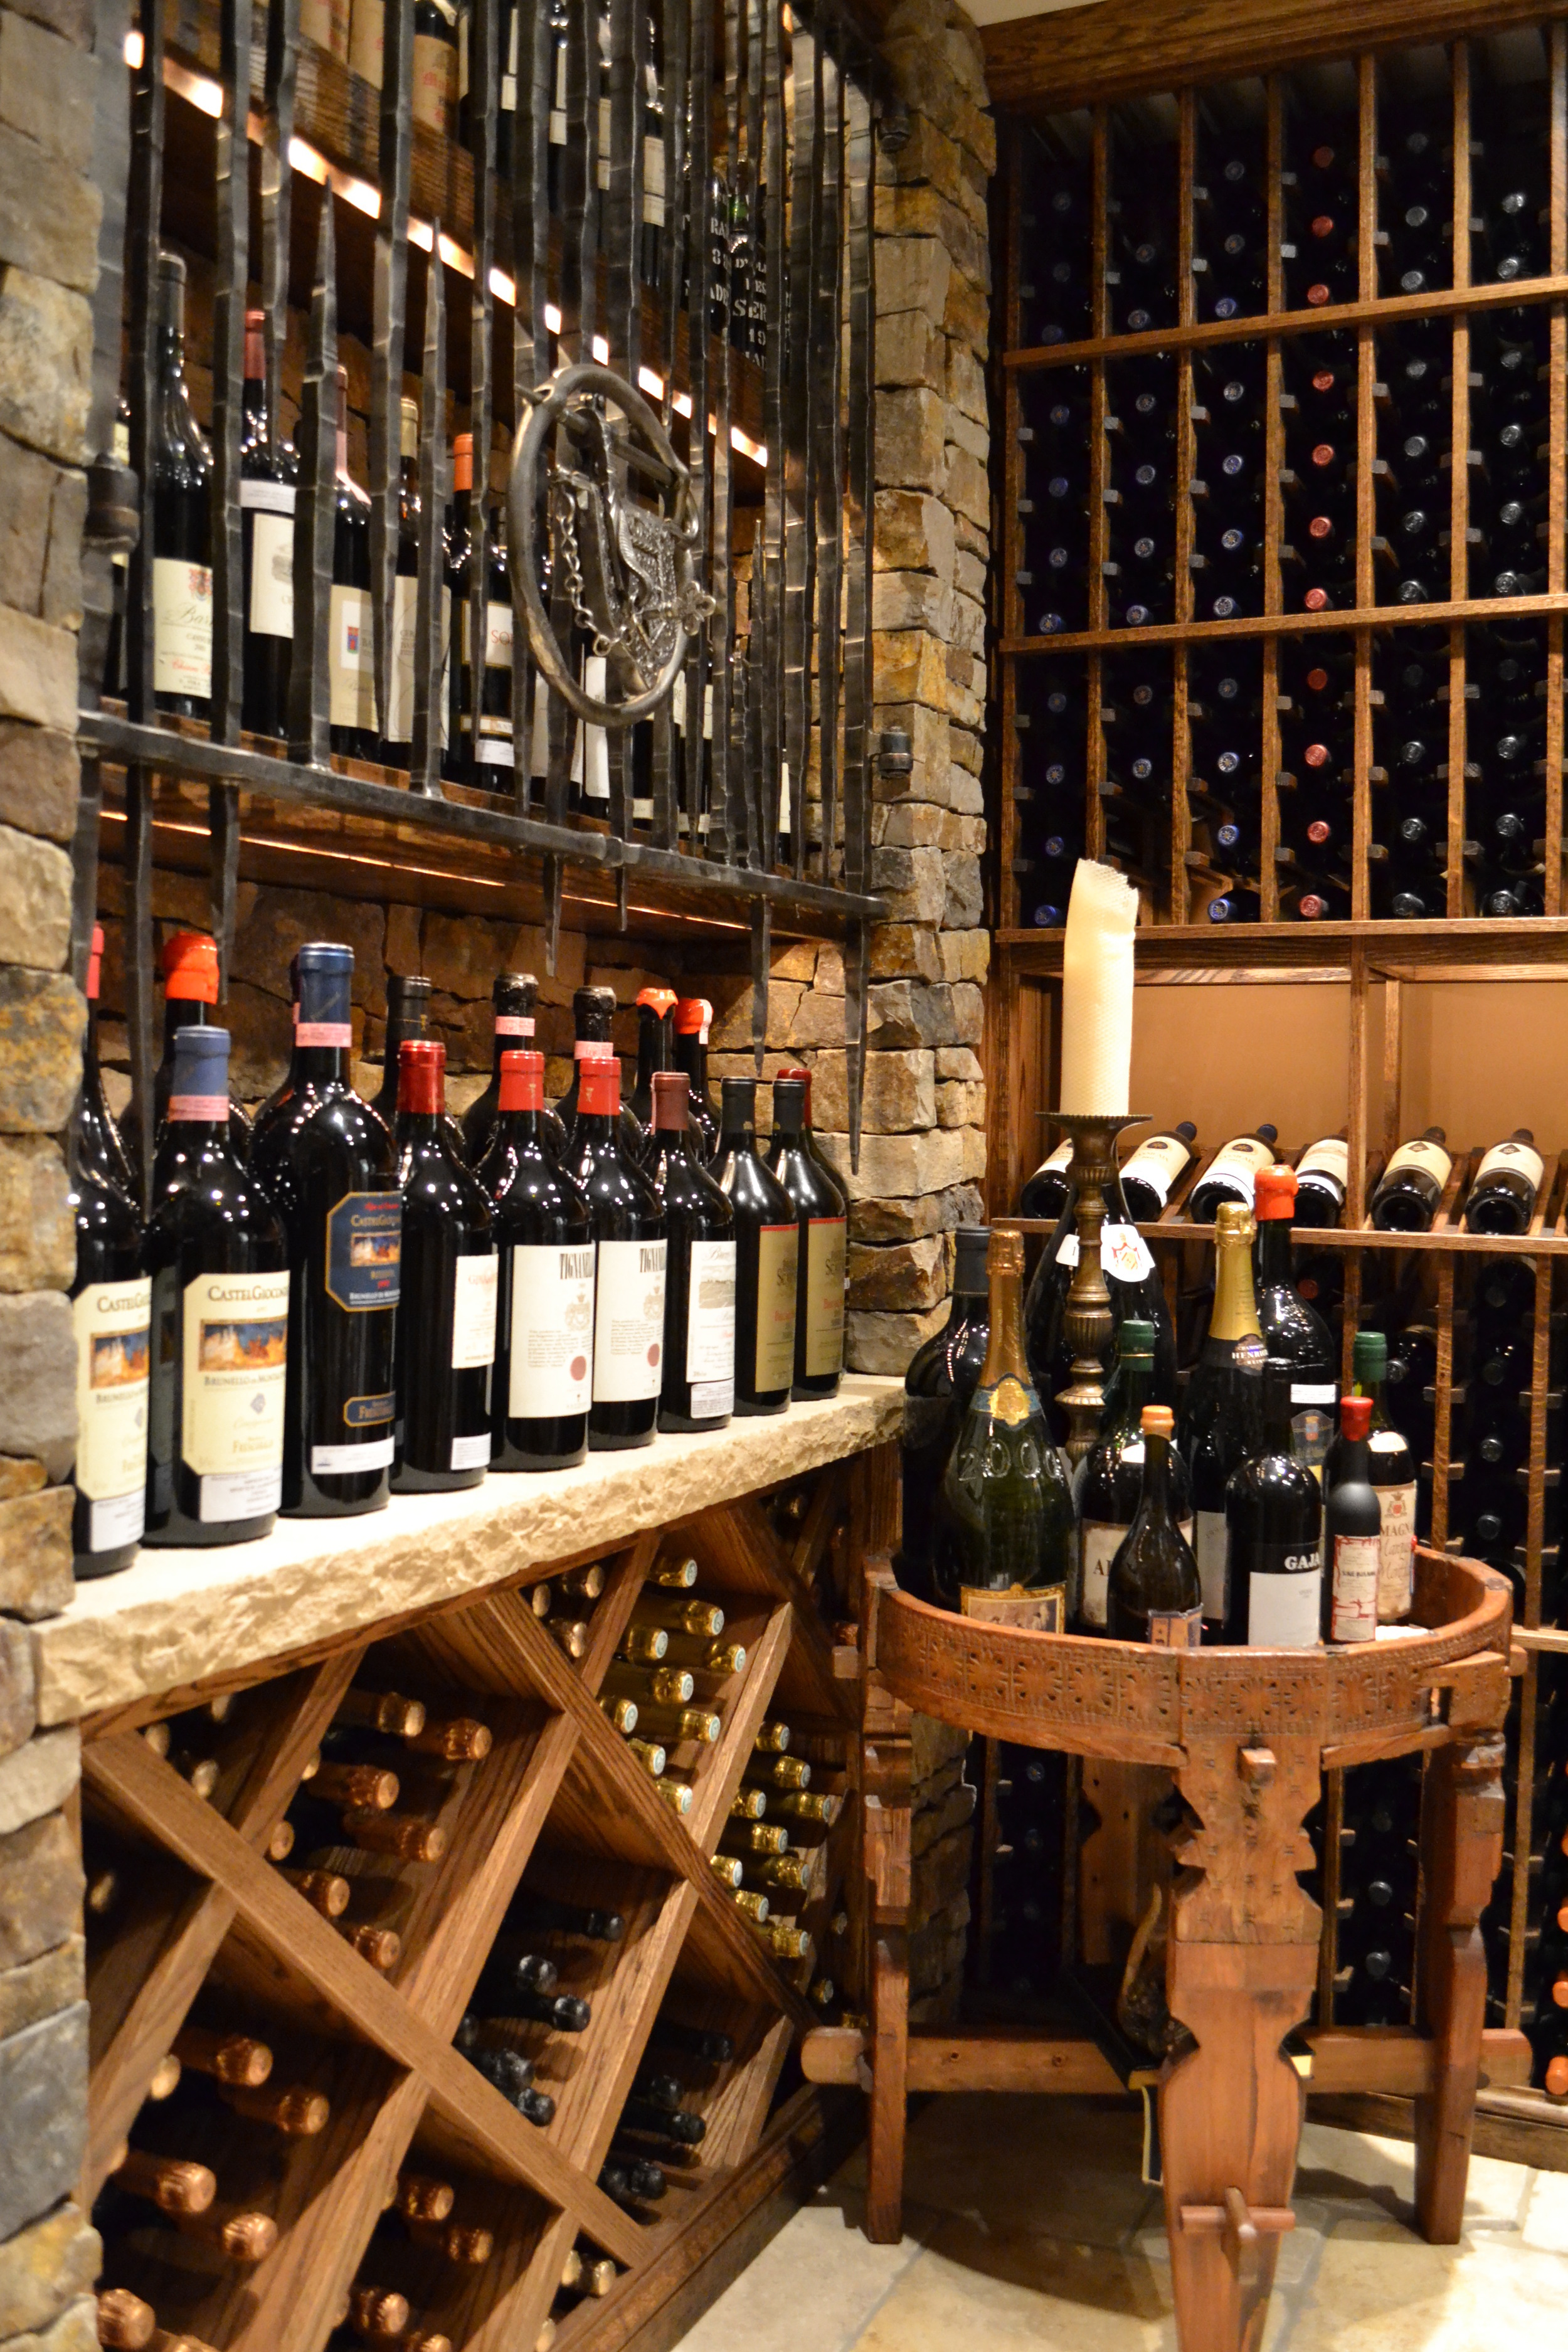 wine bottles in wine custom whine cellar